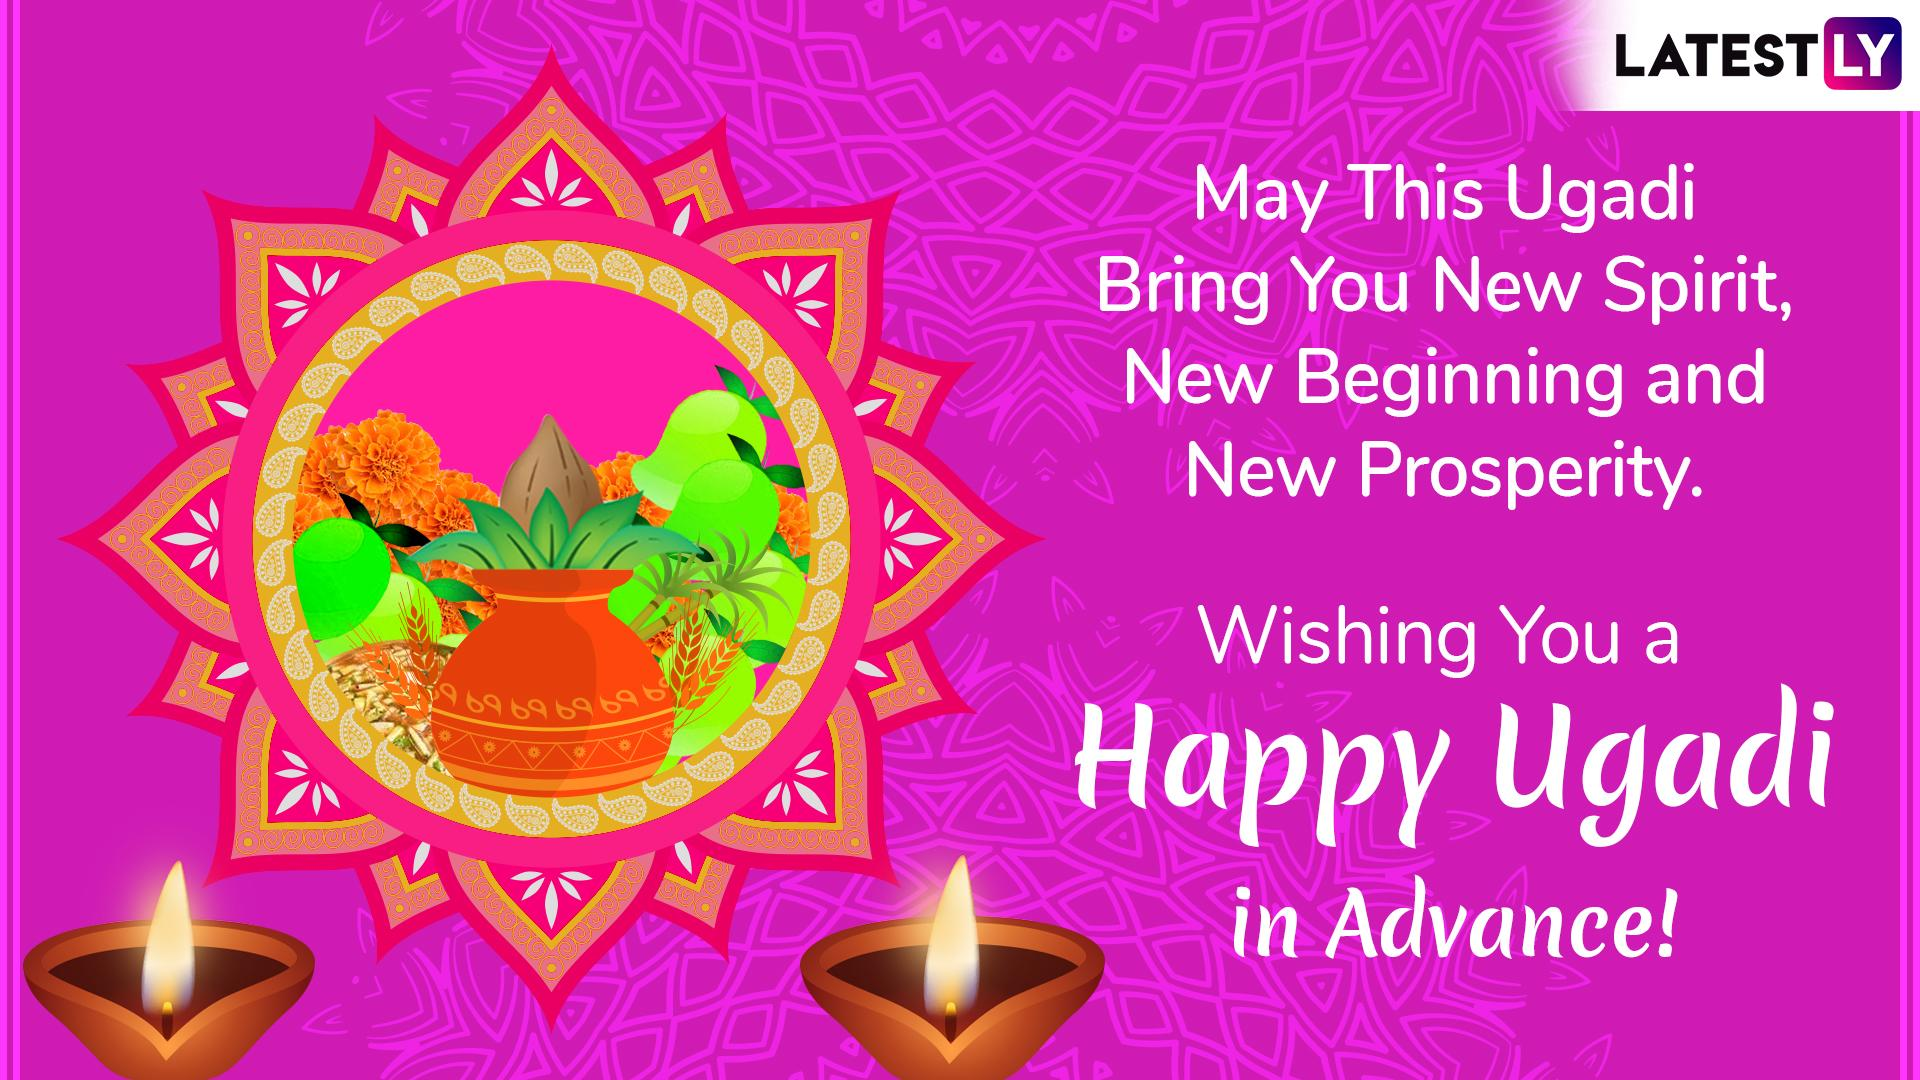 happy ugadi gudi padwa 2019 wishes in advance best